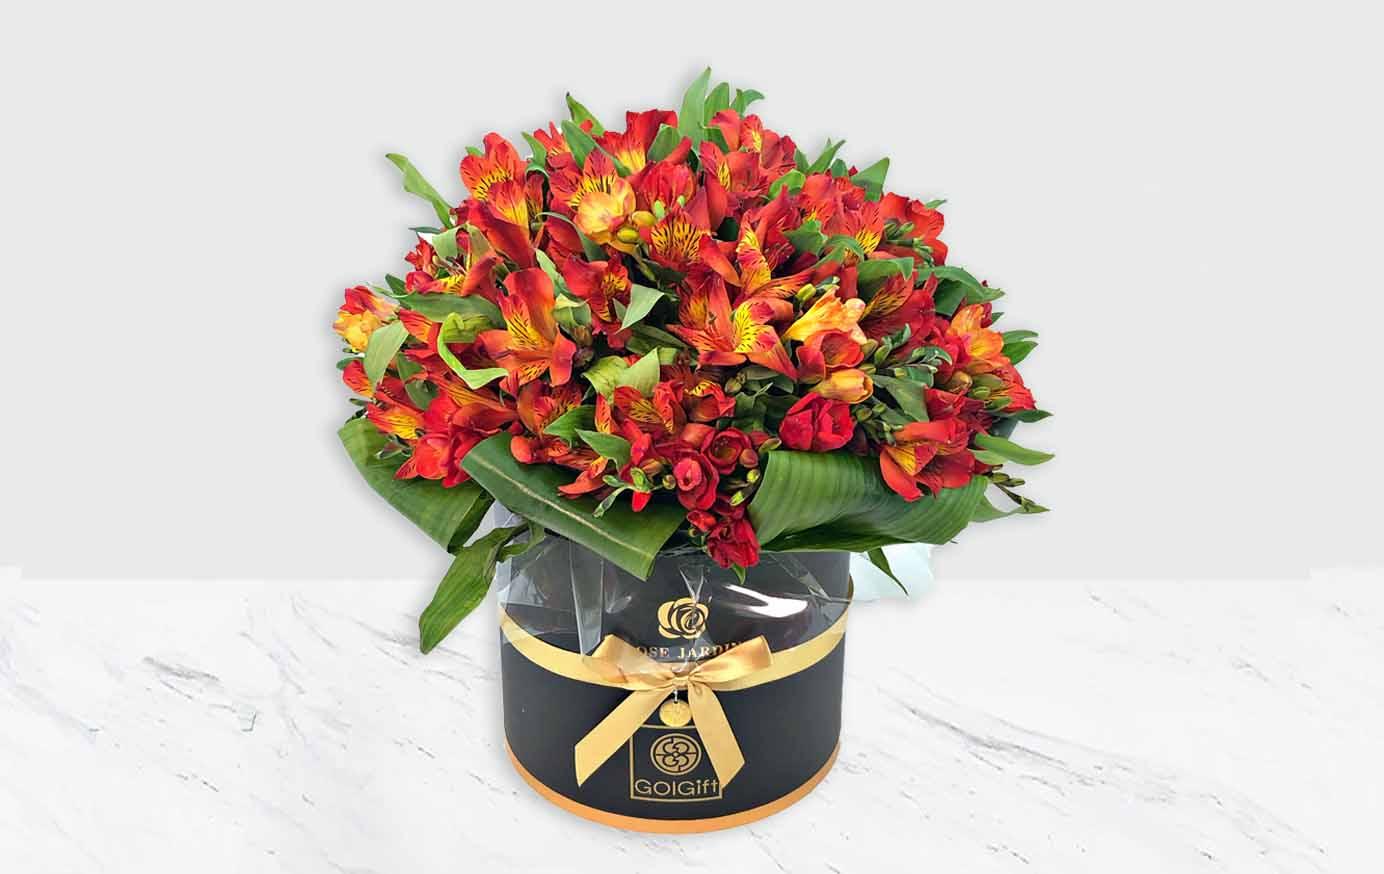 خرید باکس گل آلستر قرمز